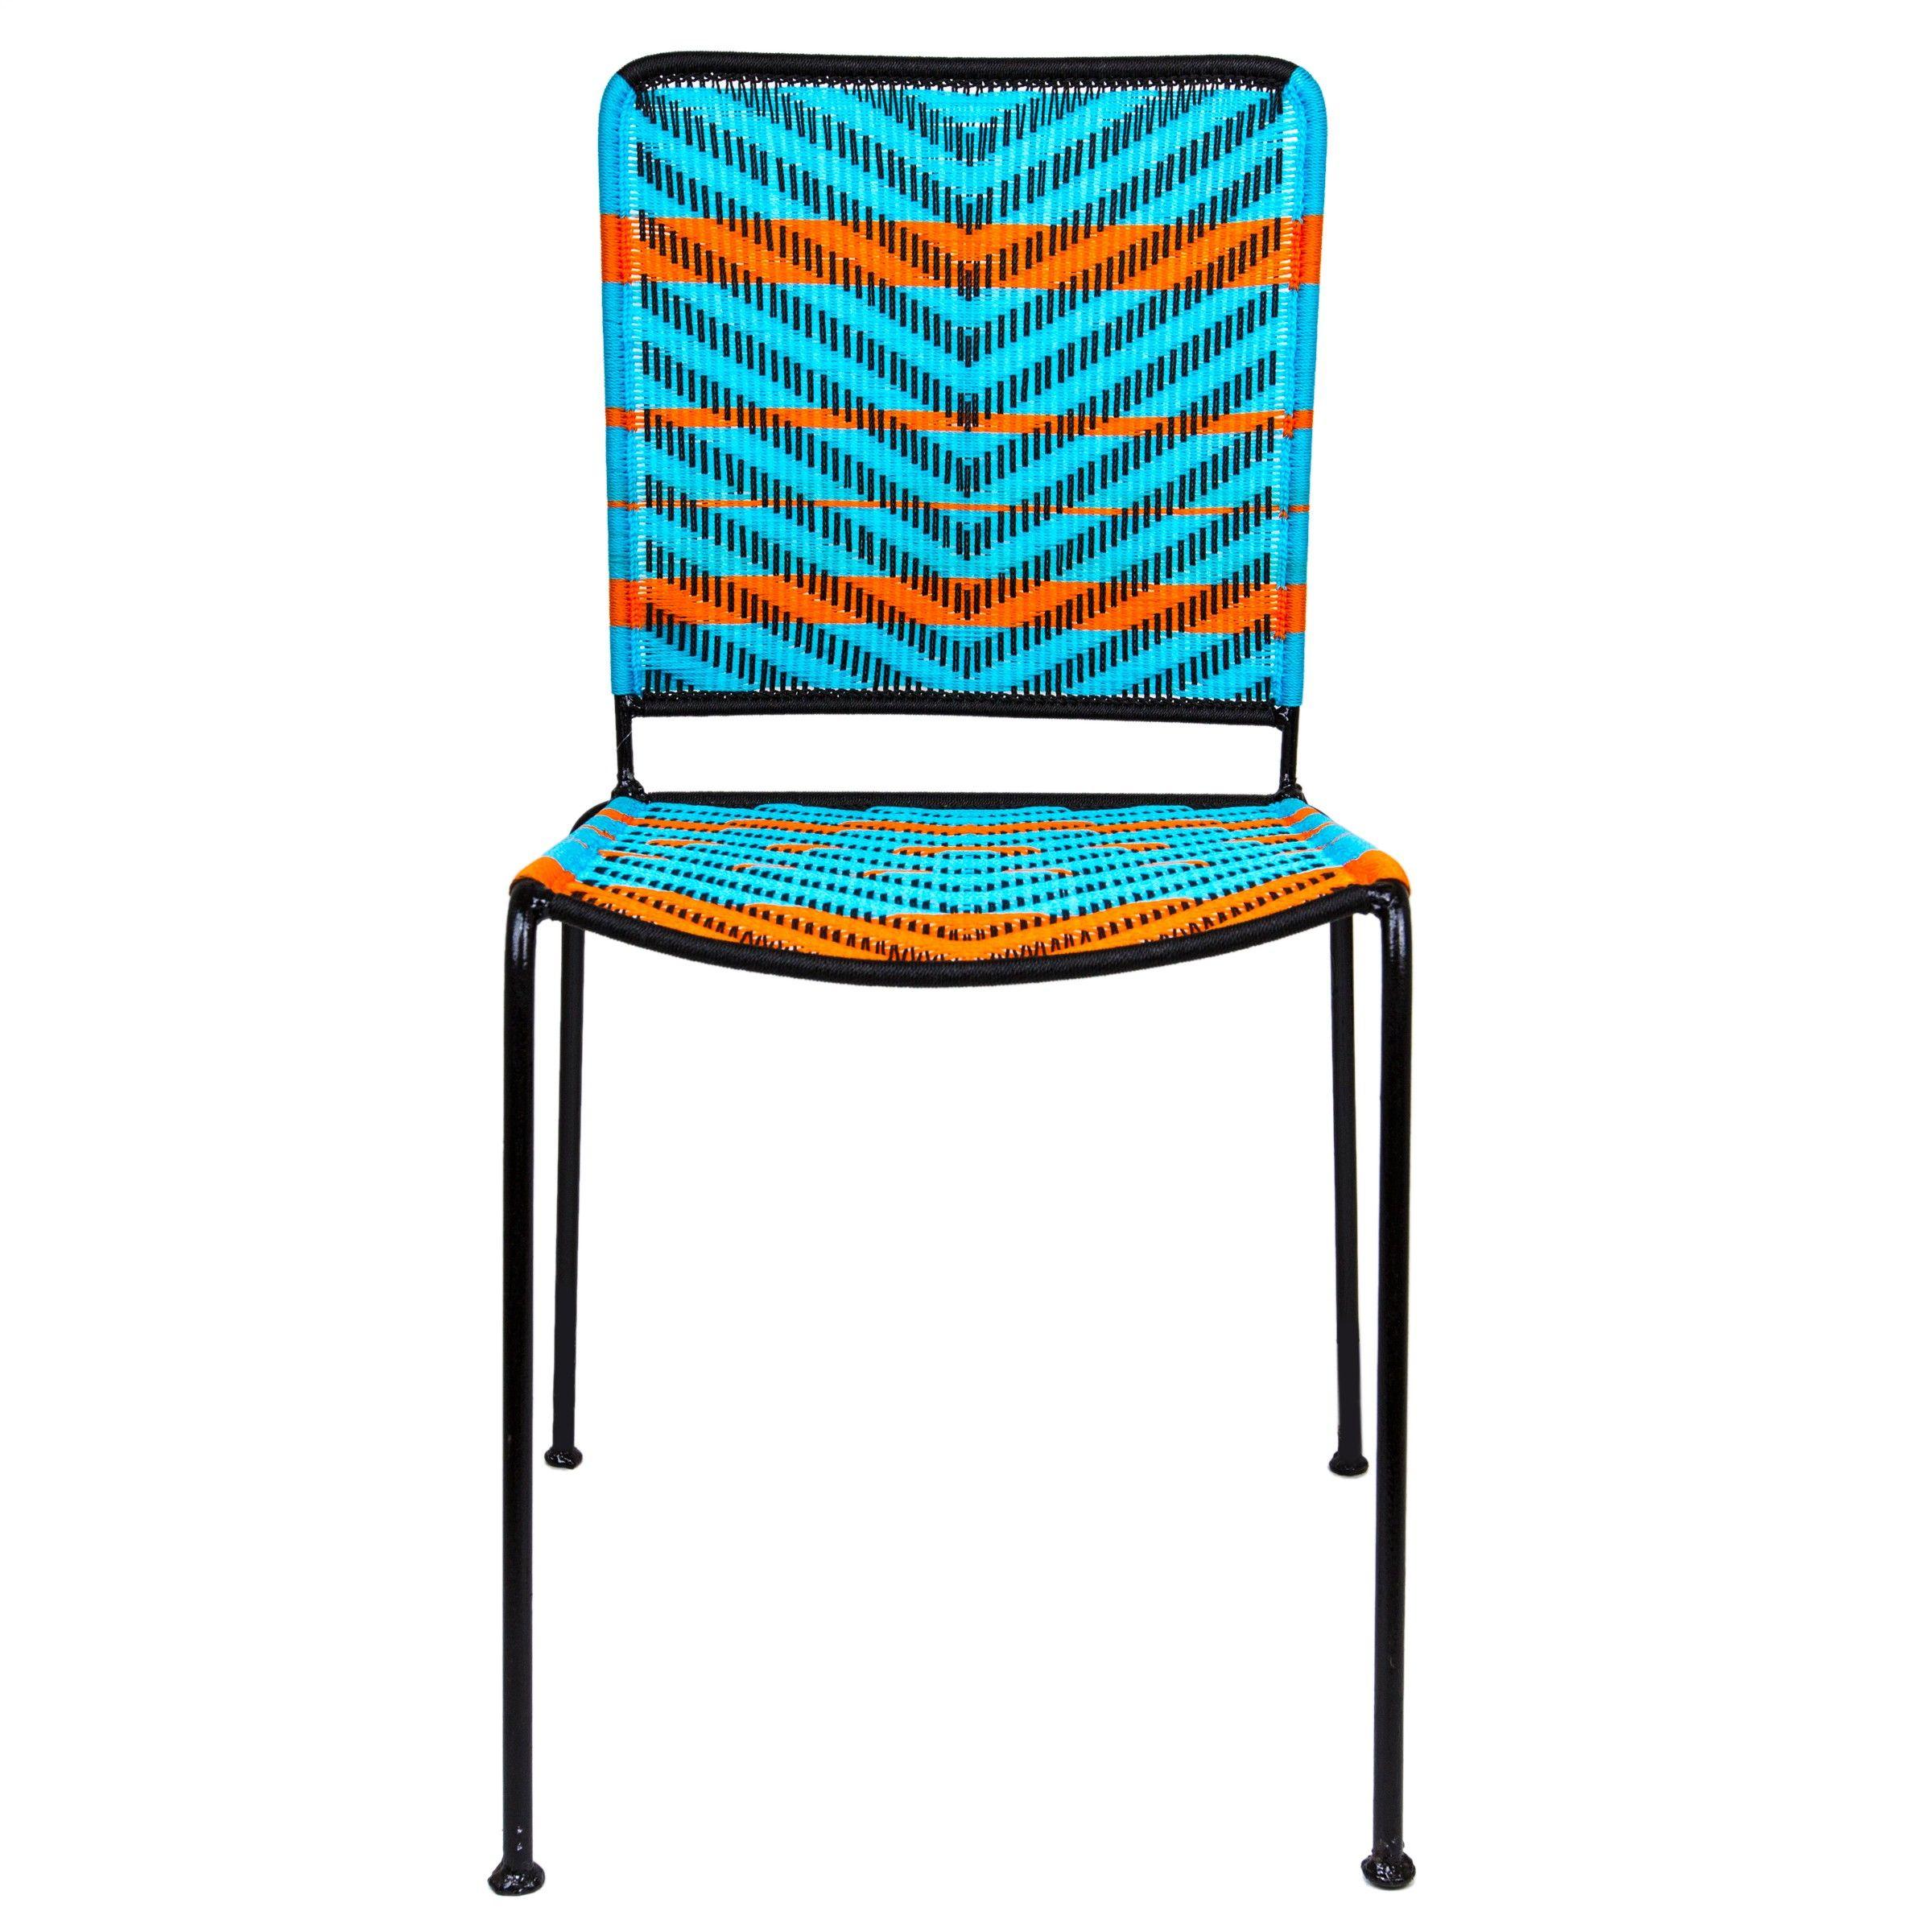 woven metal furniture. Orange \u0026 Turquoise Woven Artisan Metal Chair Furniture A